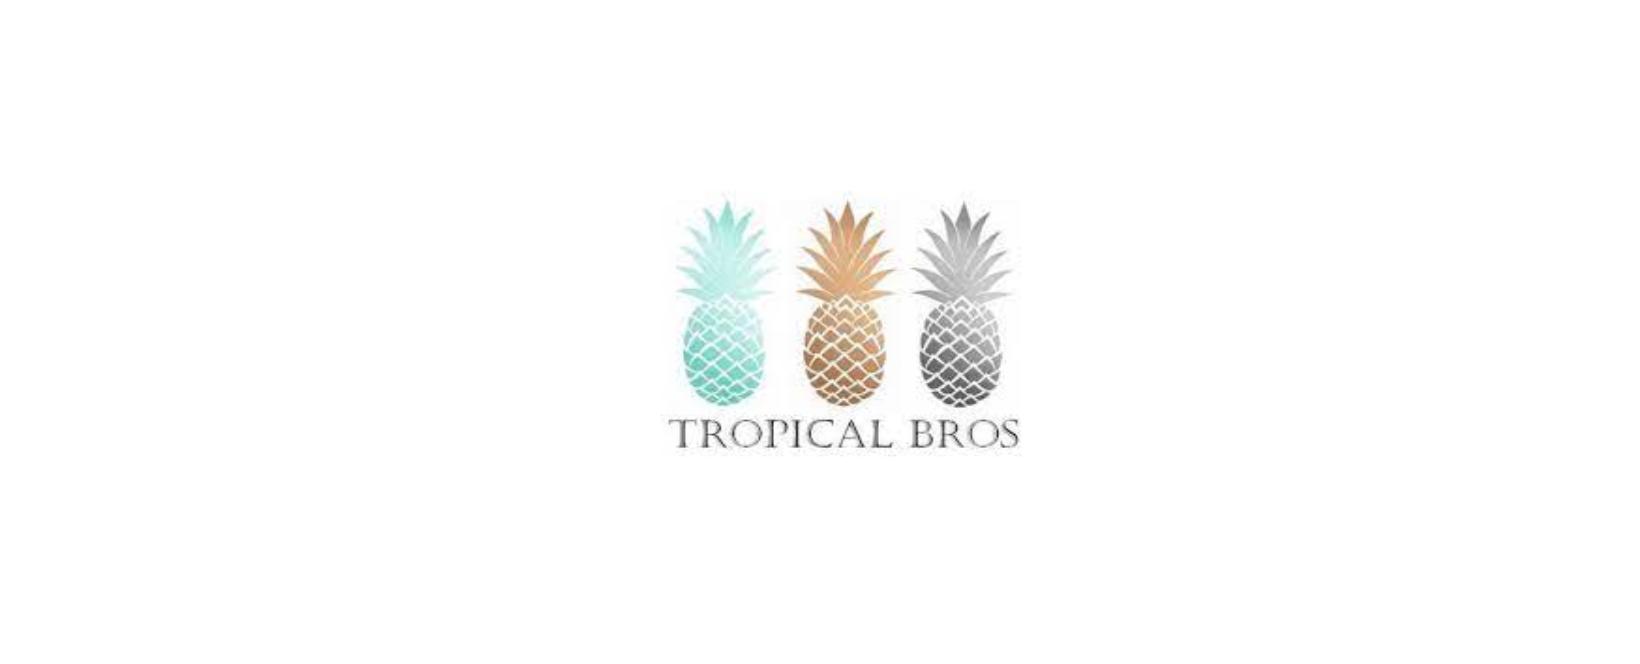 Tropical Bros Discount Code 2021